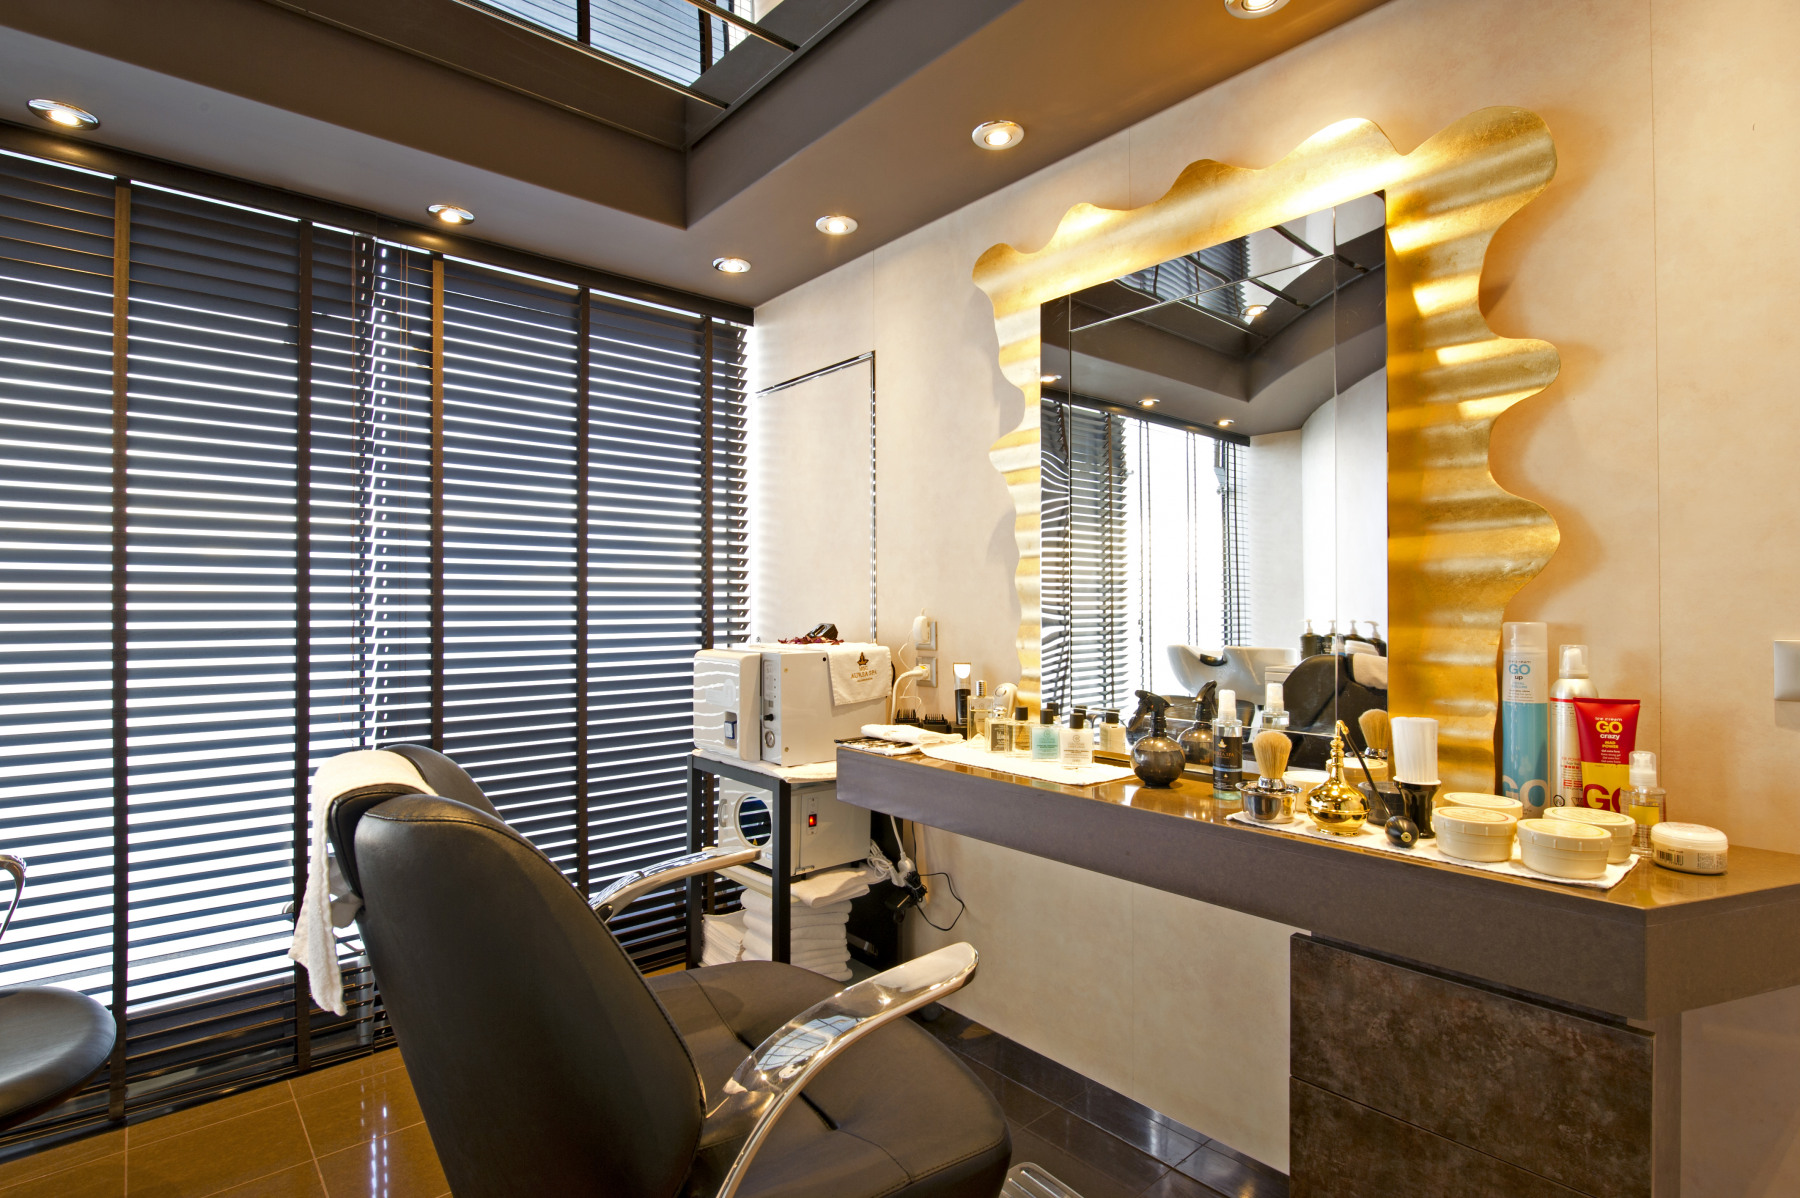 MSC Fantasia Class barbers.jpg